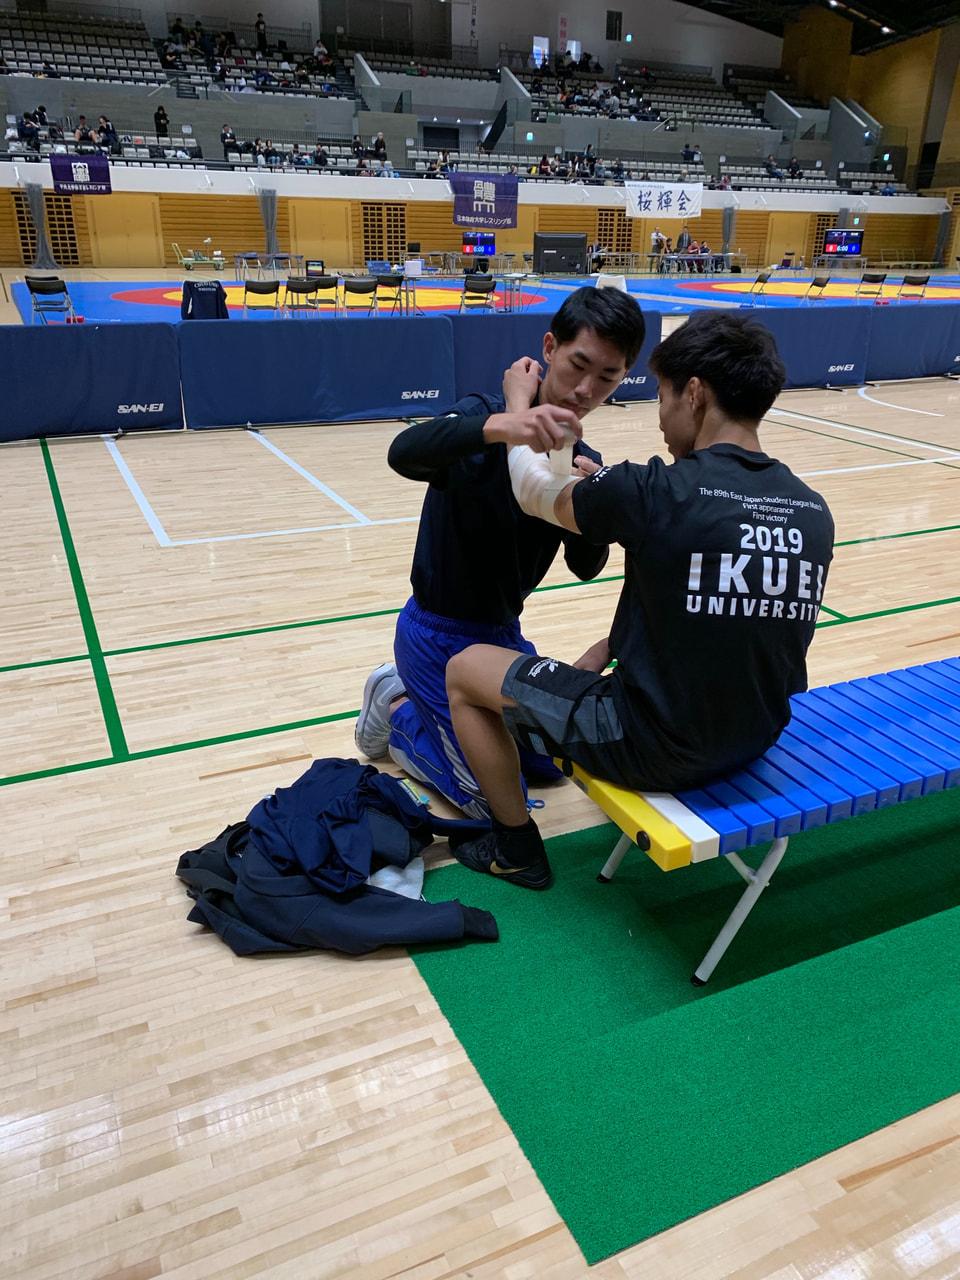 秋季東日本学生レスリング選手権 救護 1日目